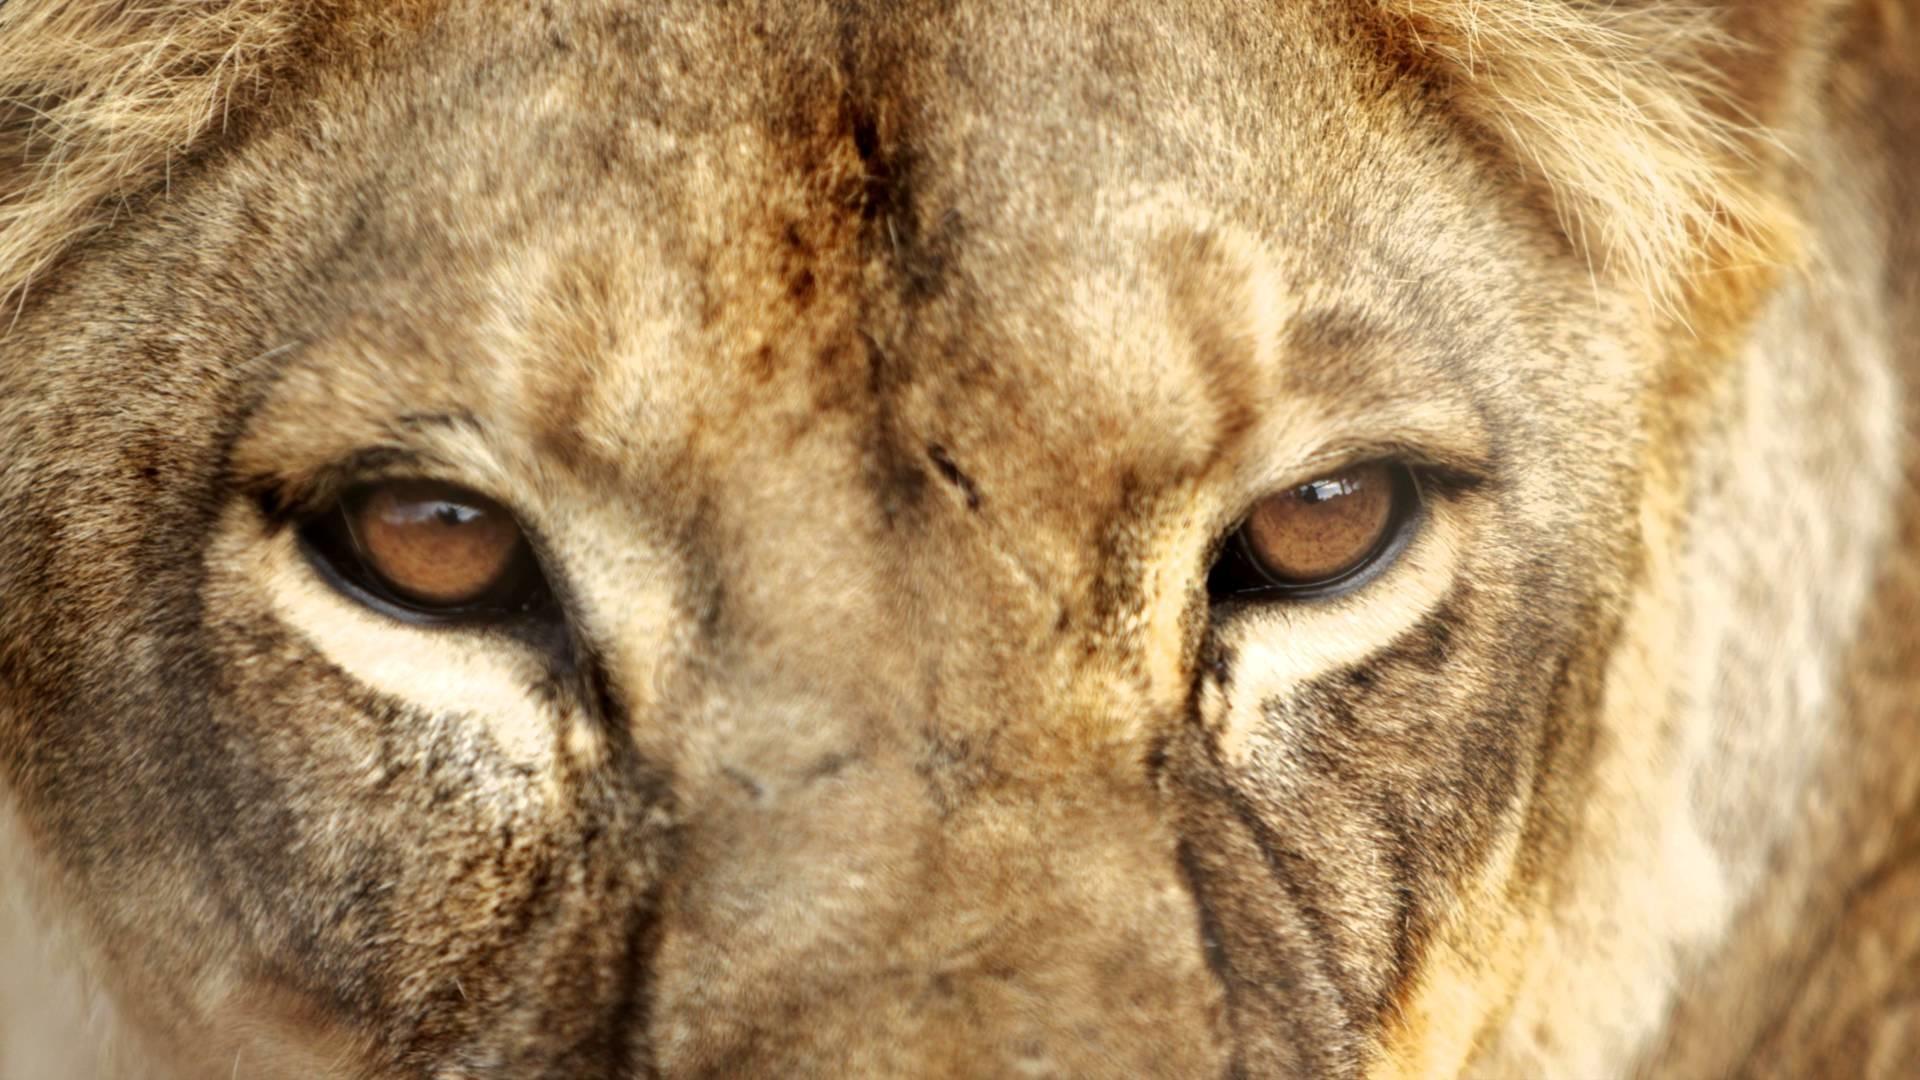 Download The Lion's Roar Wallpaper - Lions Eyes Close Up , HD Wallpaper & Backgrounds